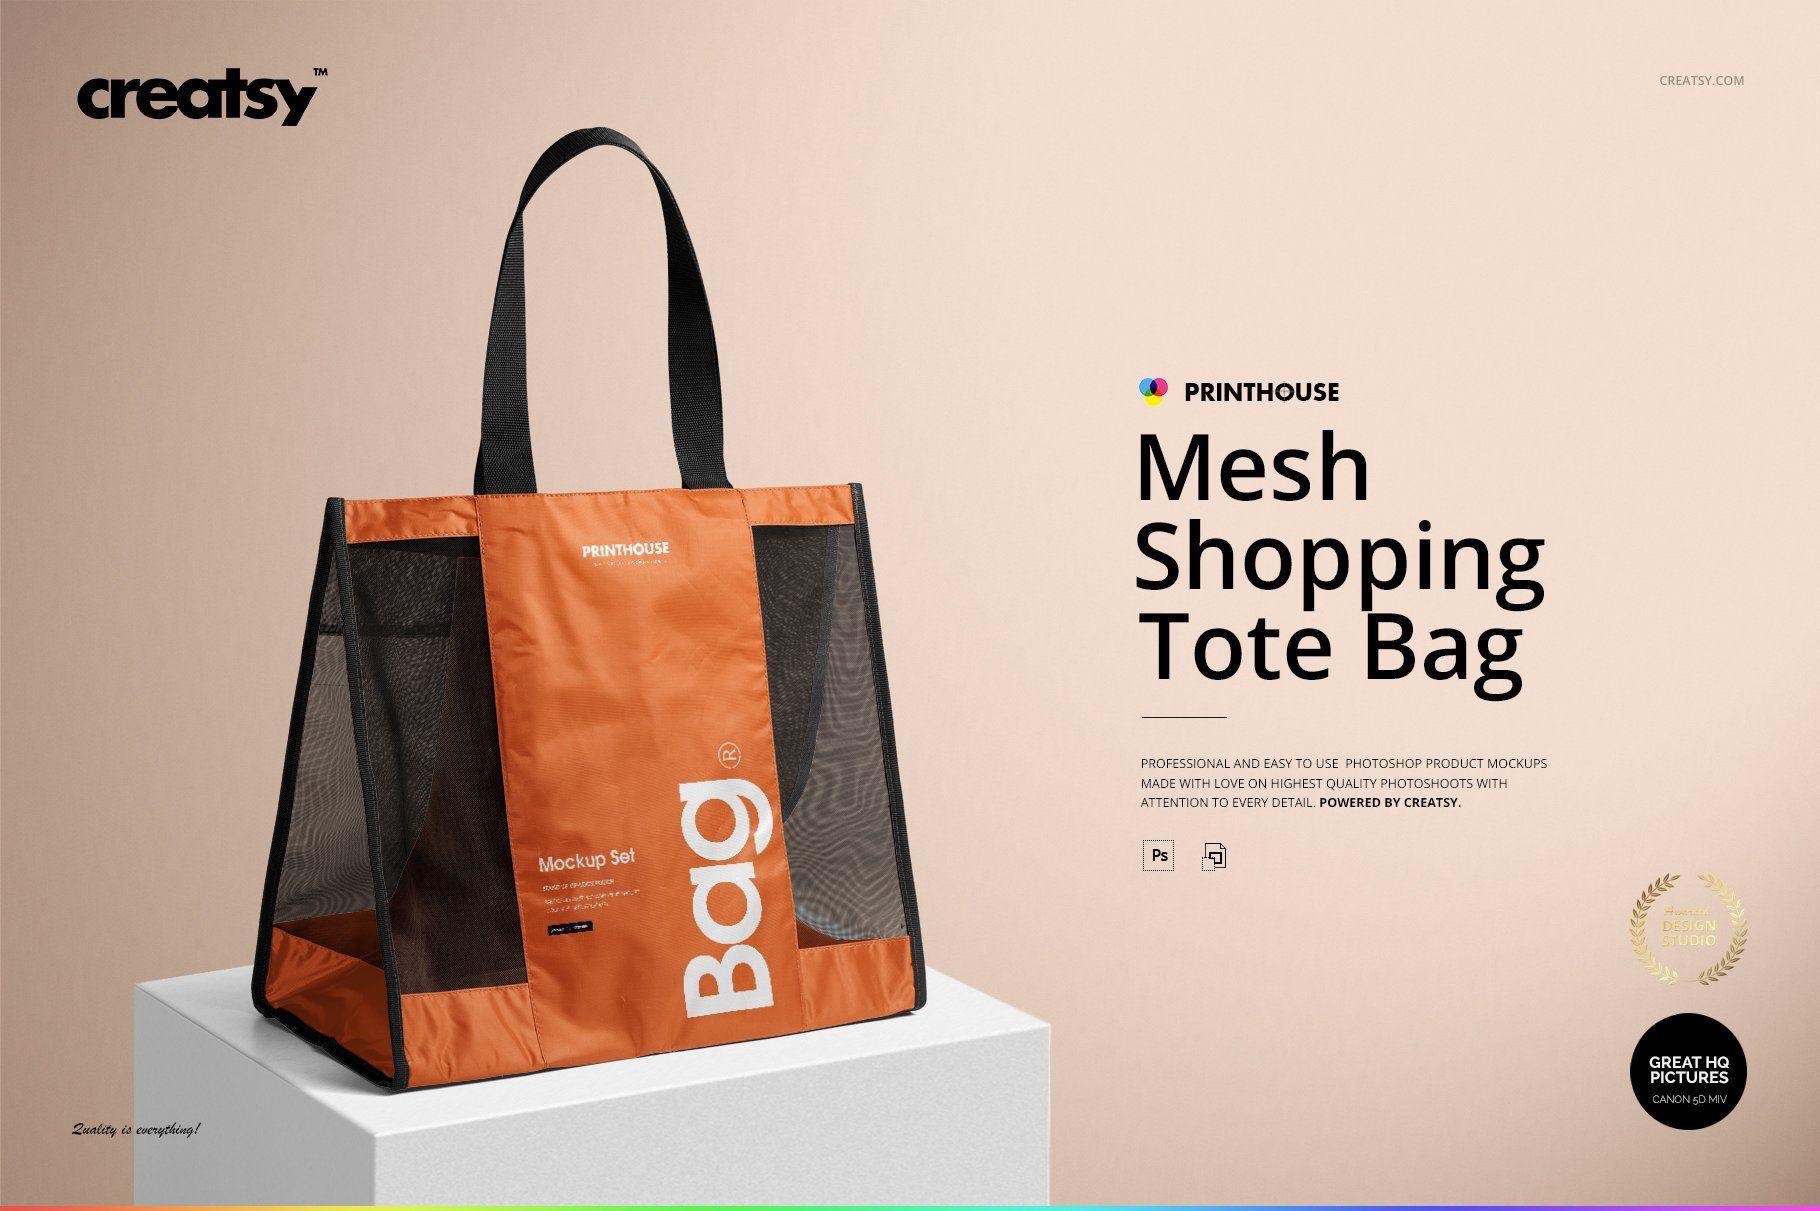 Download Mesh Shopping Tote Bag Mockup Set Shopping Tote Bag Tote Bag Shopping Tote